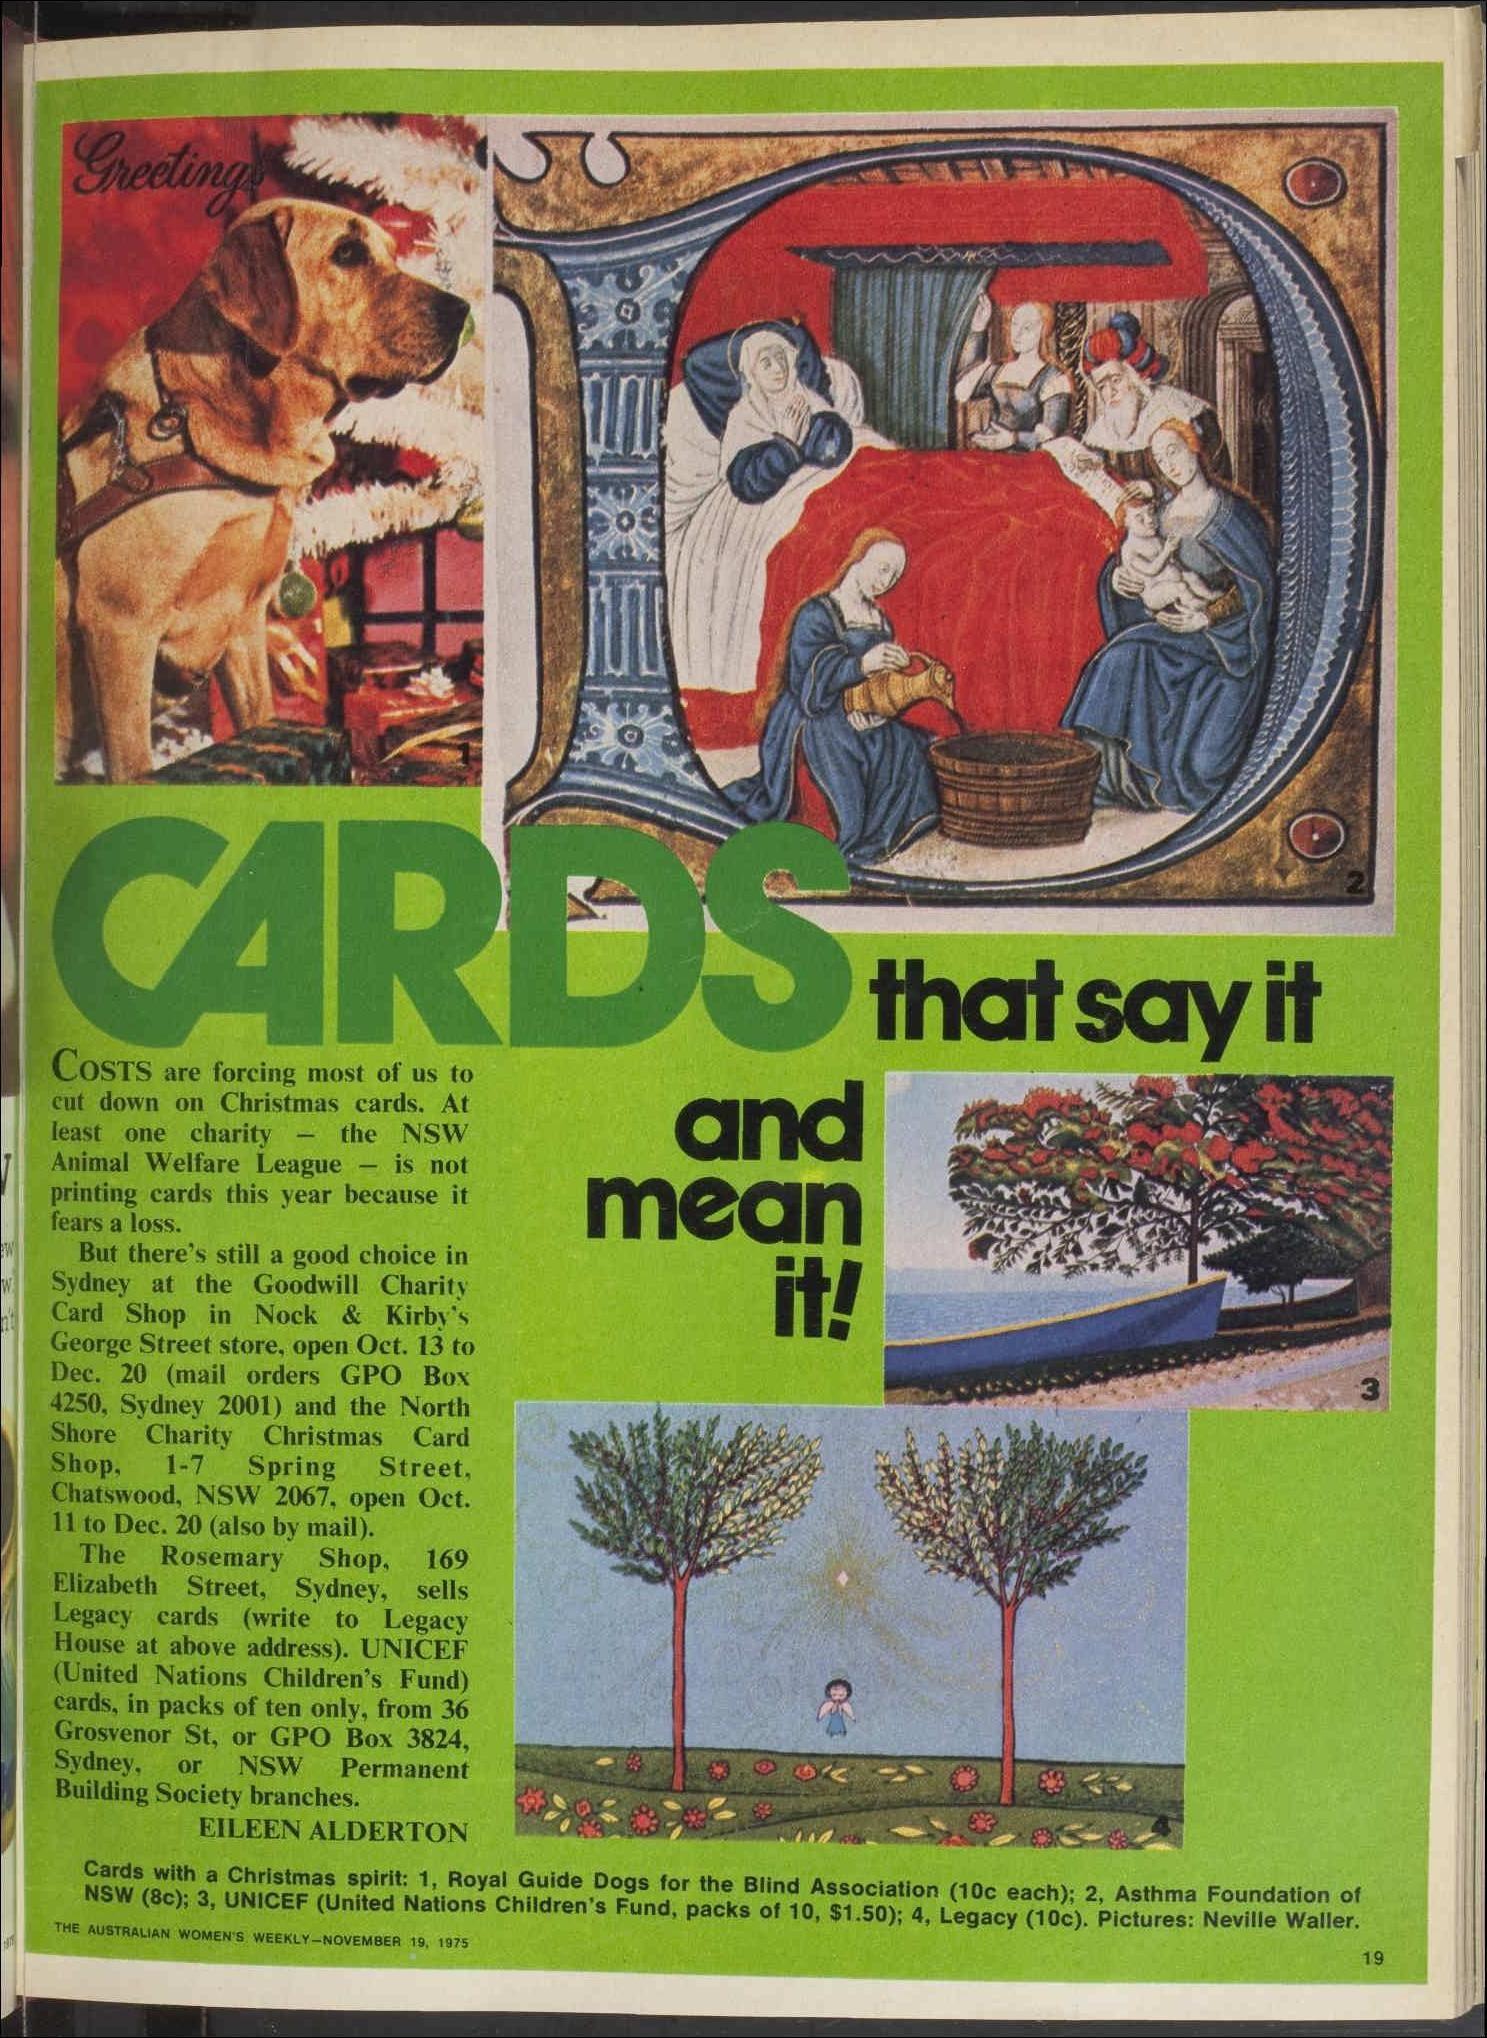 Issue 19 Nov 1975 The Australian Women's Wee